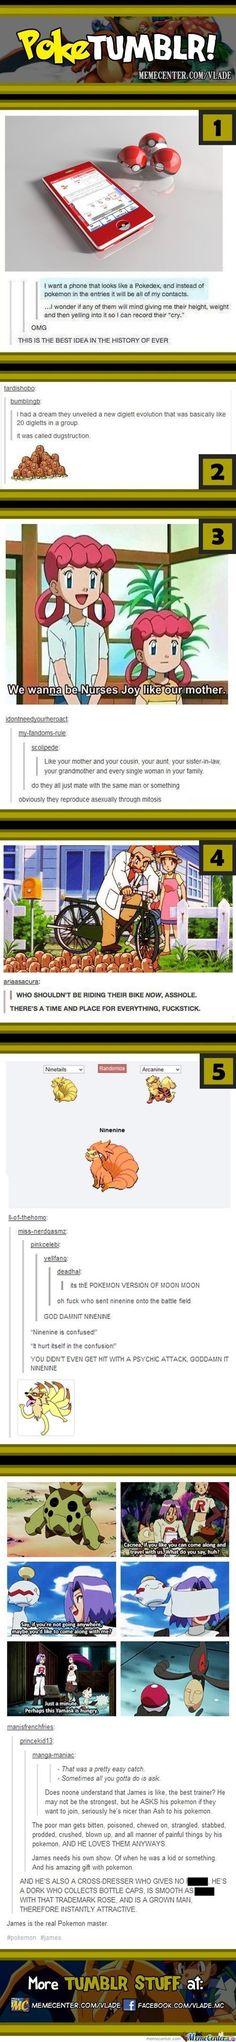 Meme Center : Vlade Posts - Page 73 Ninenine is the Pokemon equivalent of Moon Moon